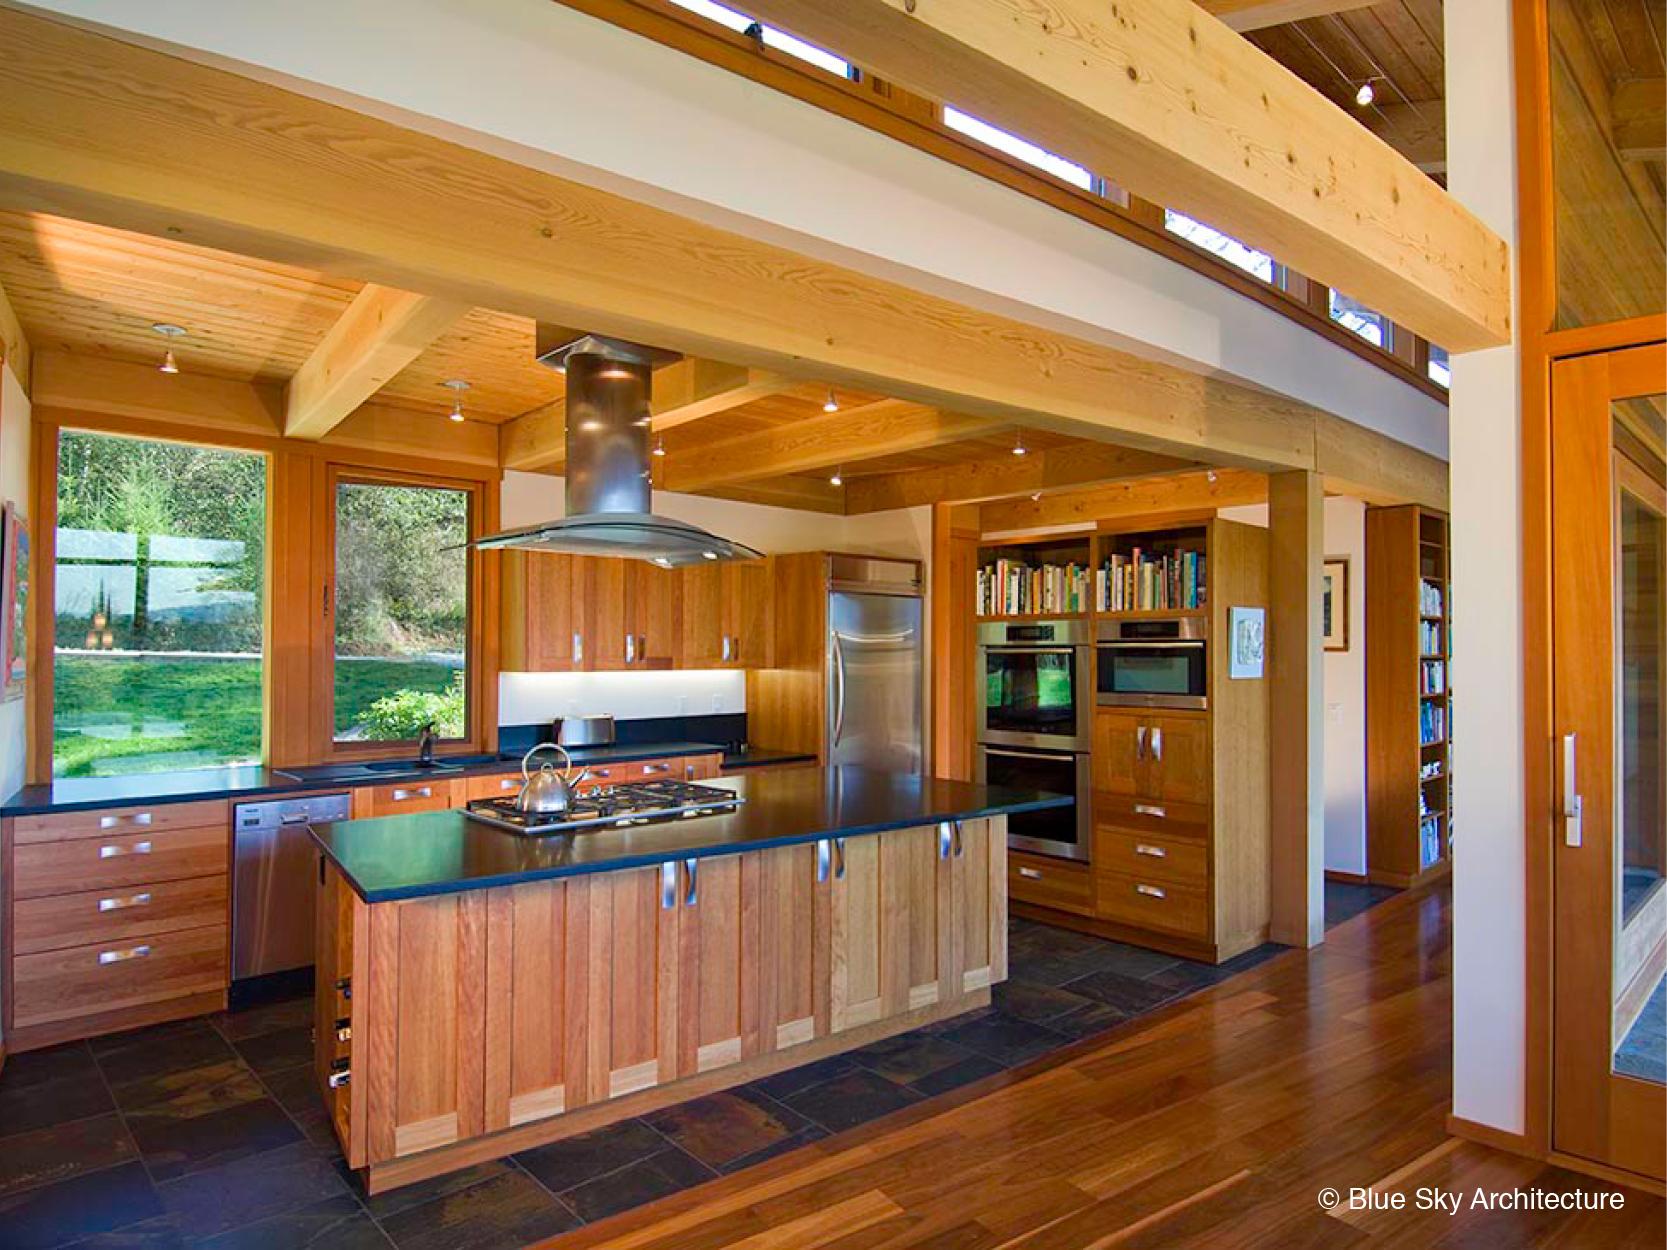 HollyFarm-house-interior-kitchen-wood-material.jpg